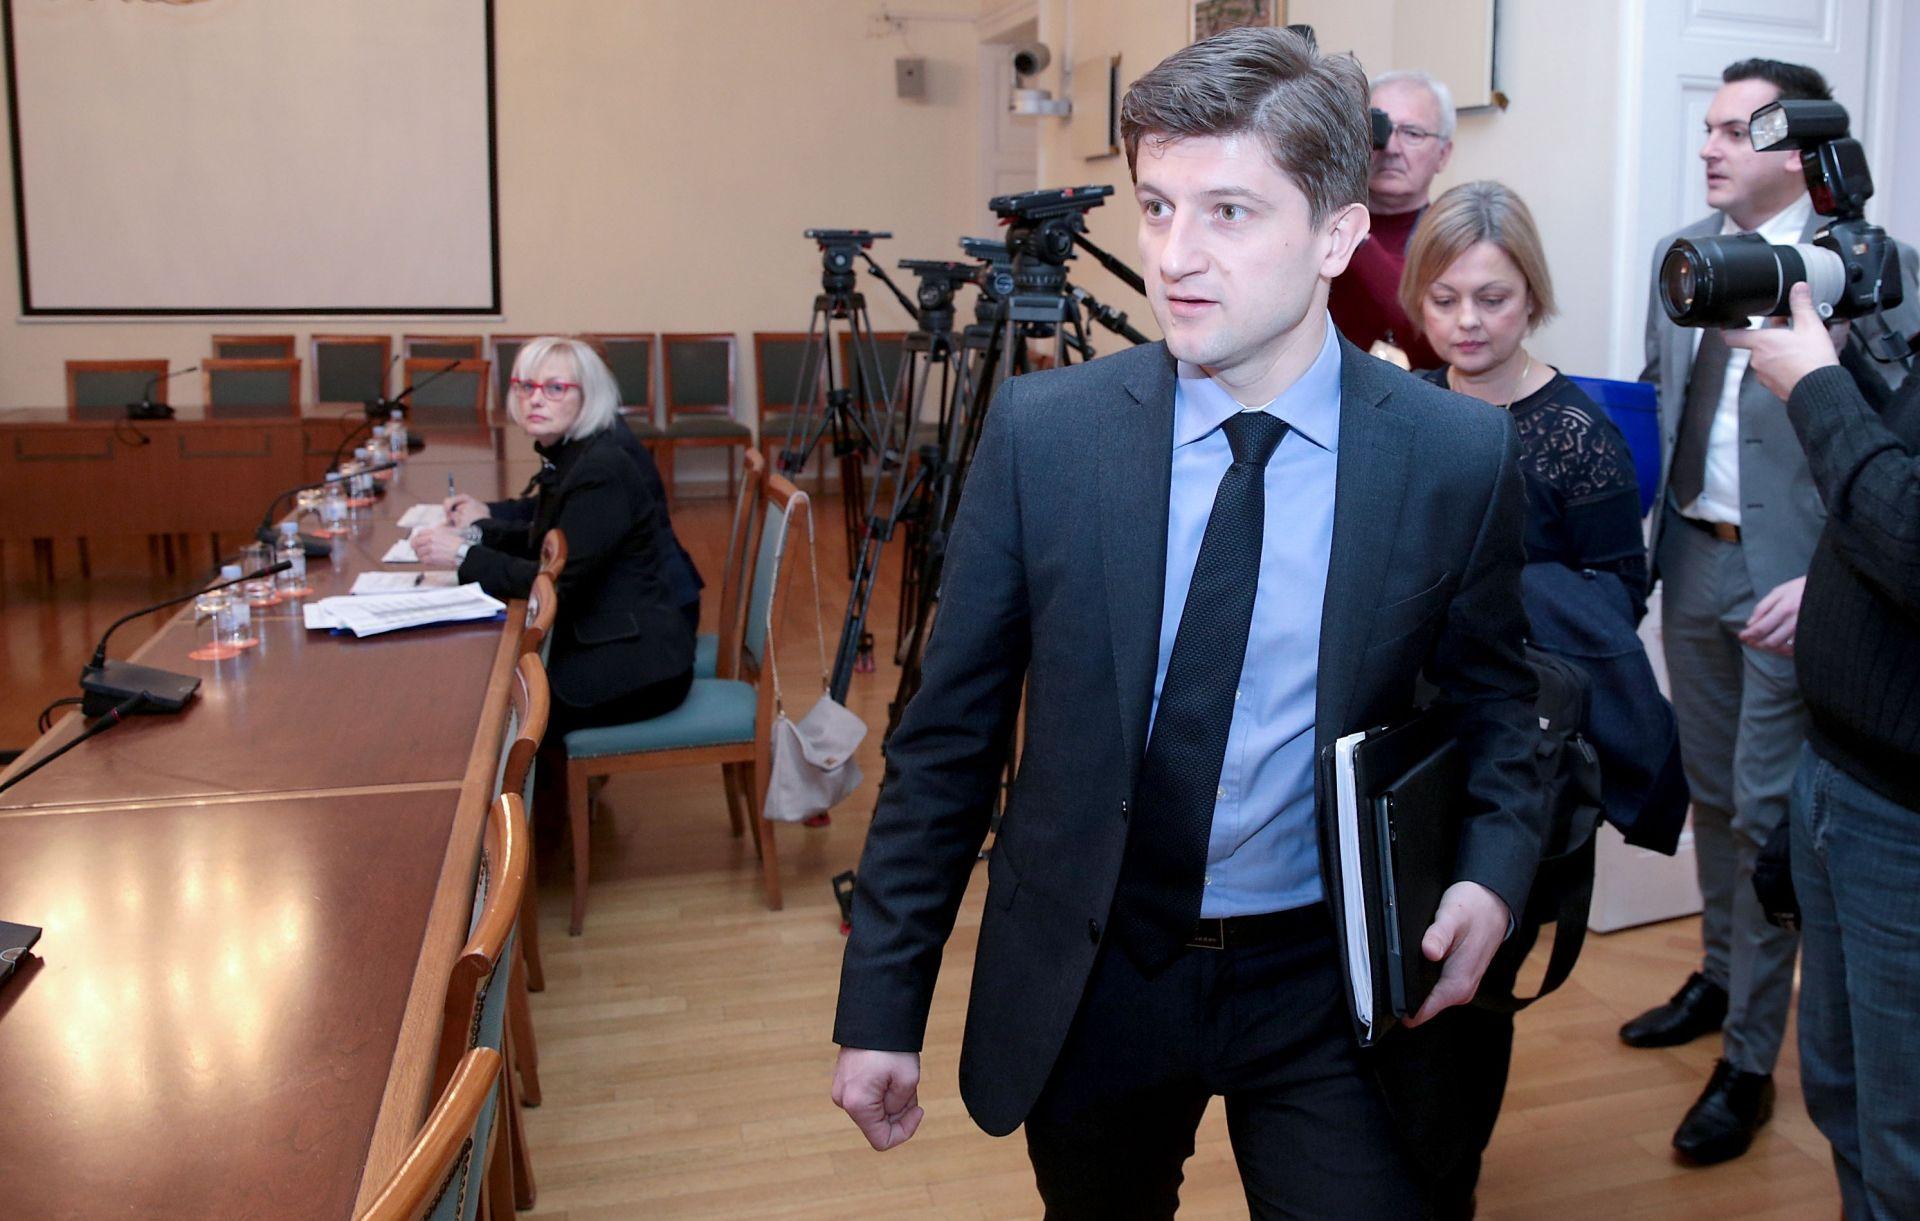 MINISTAR ZDRAVKO MARIĆ: Nema govora o eventualnom preustroju Vlade